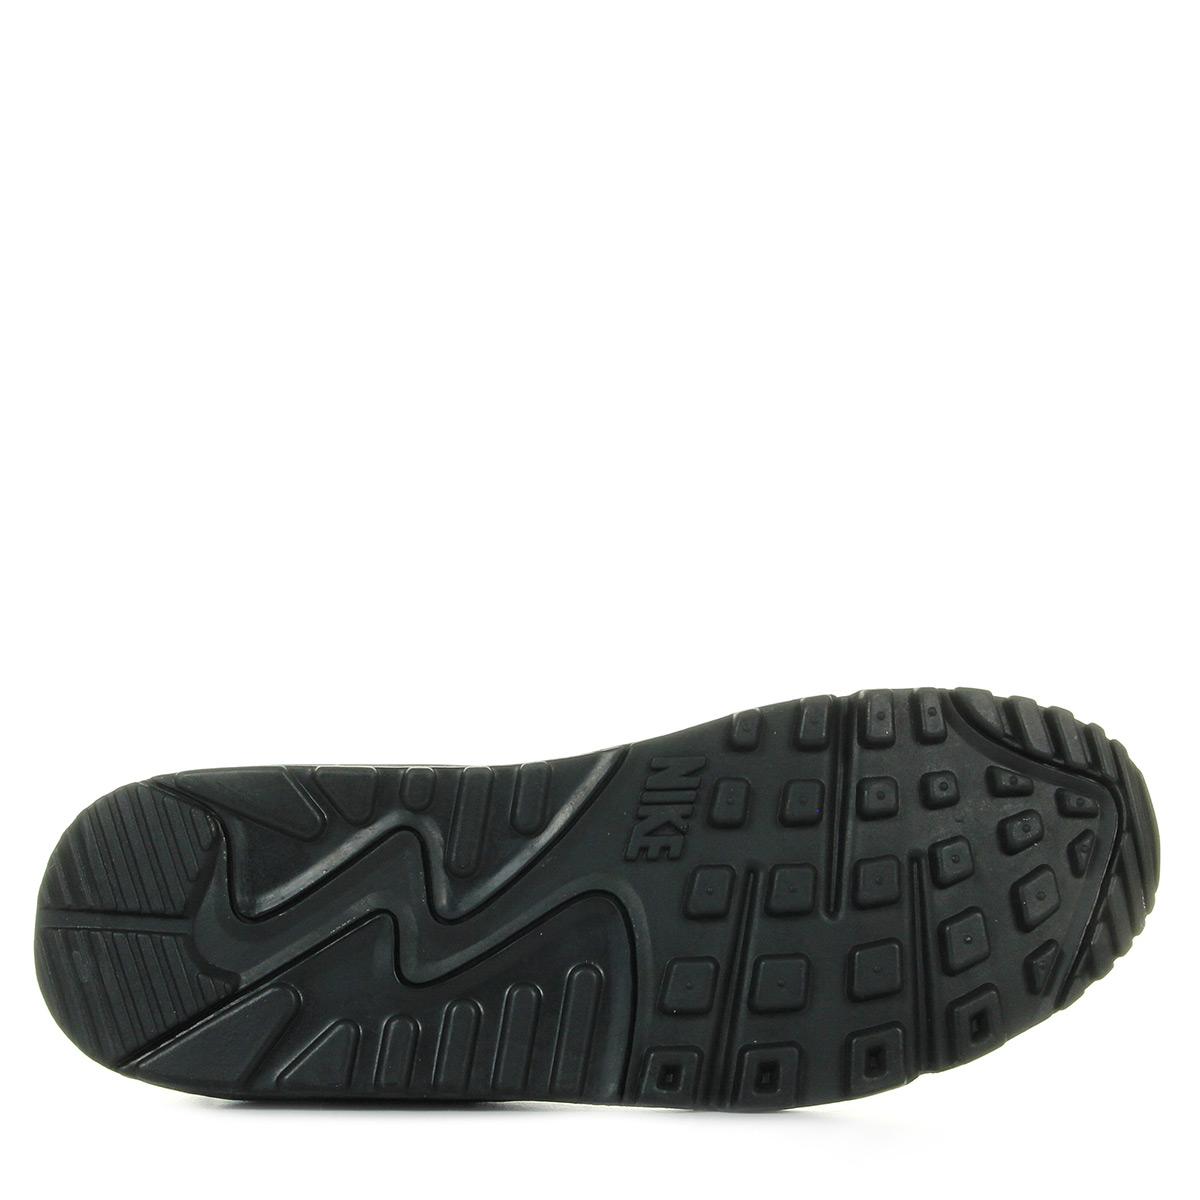 sale retailer 40c14 7f91c Nike Air Max 90 Leather